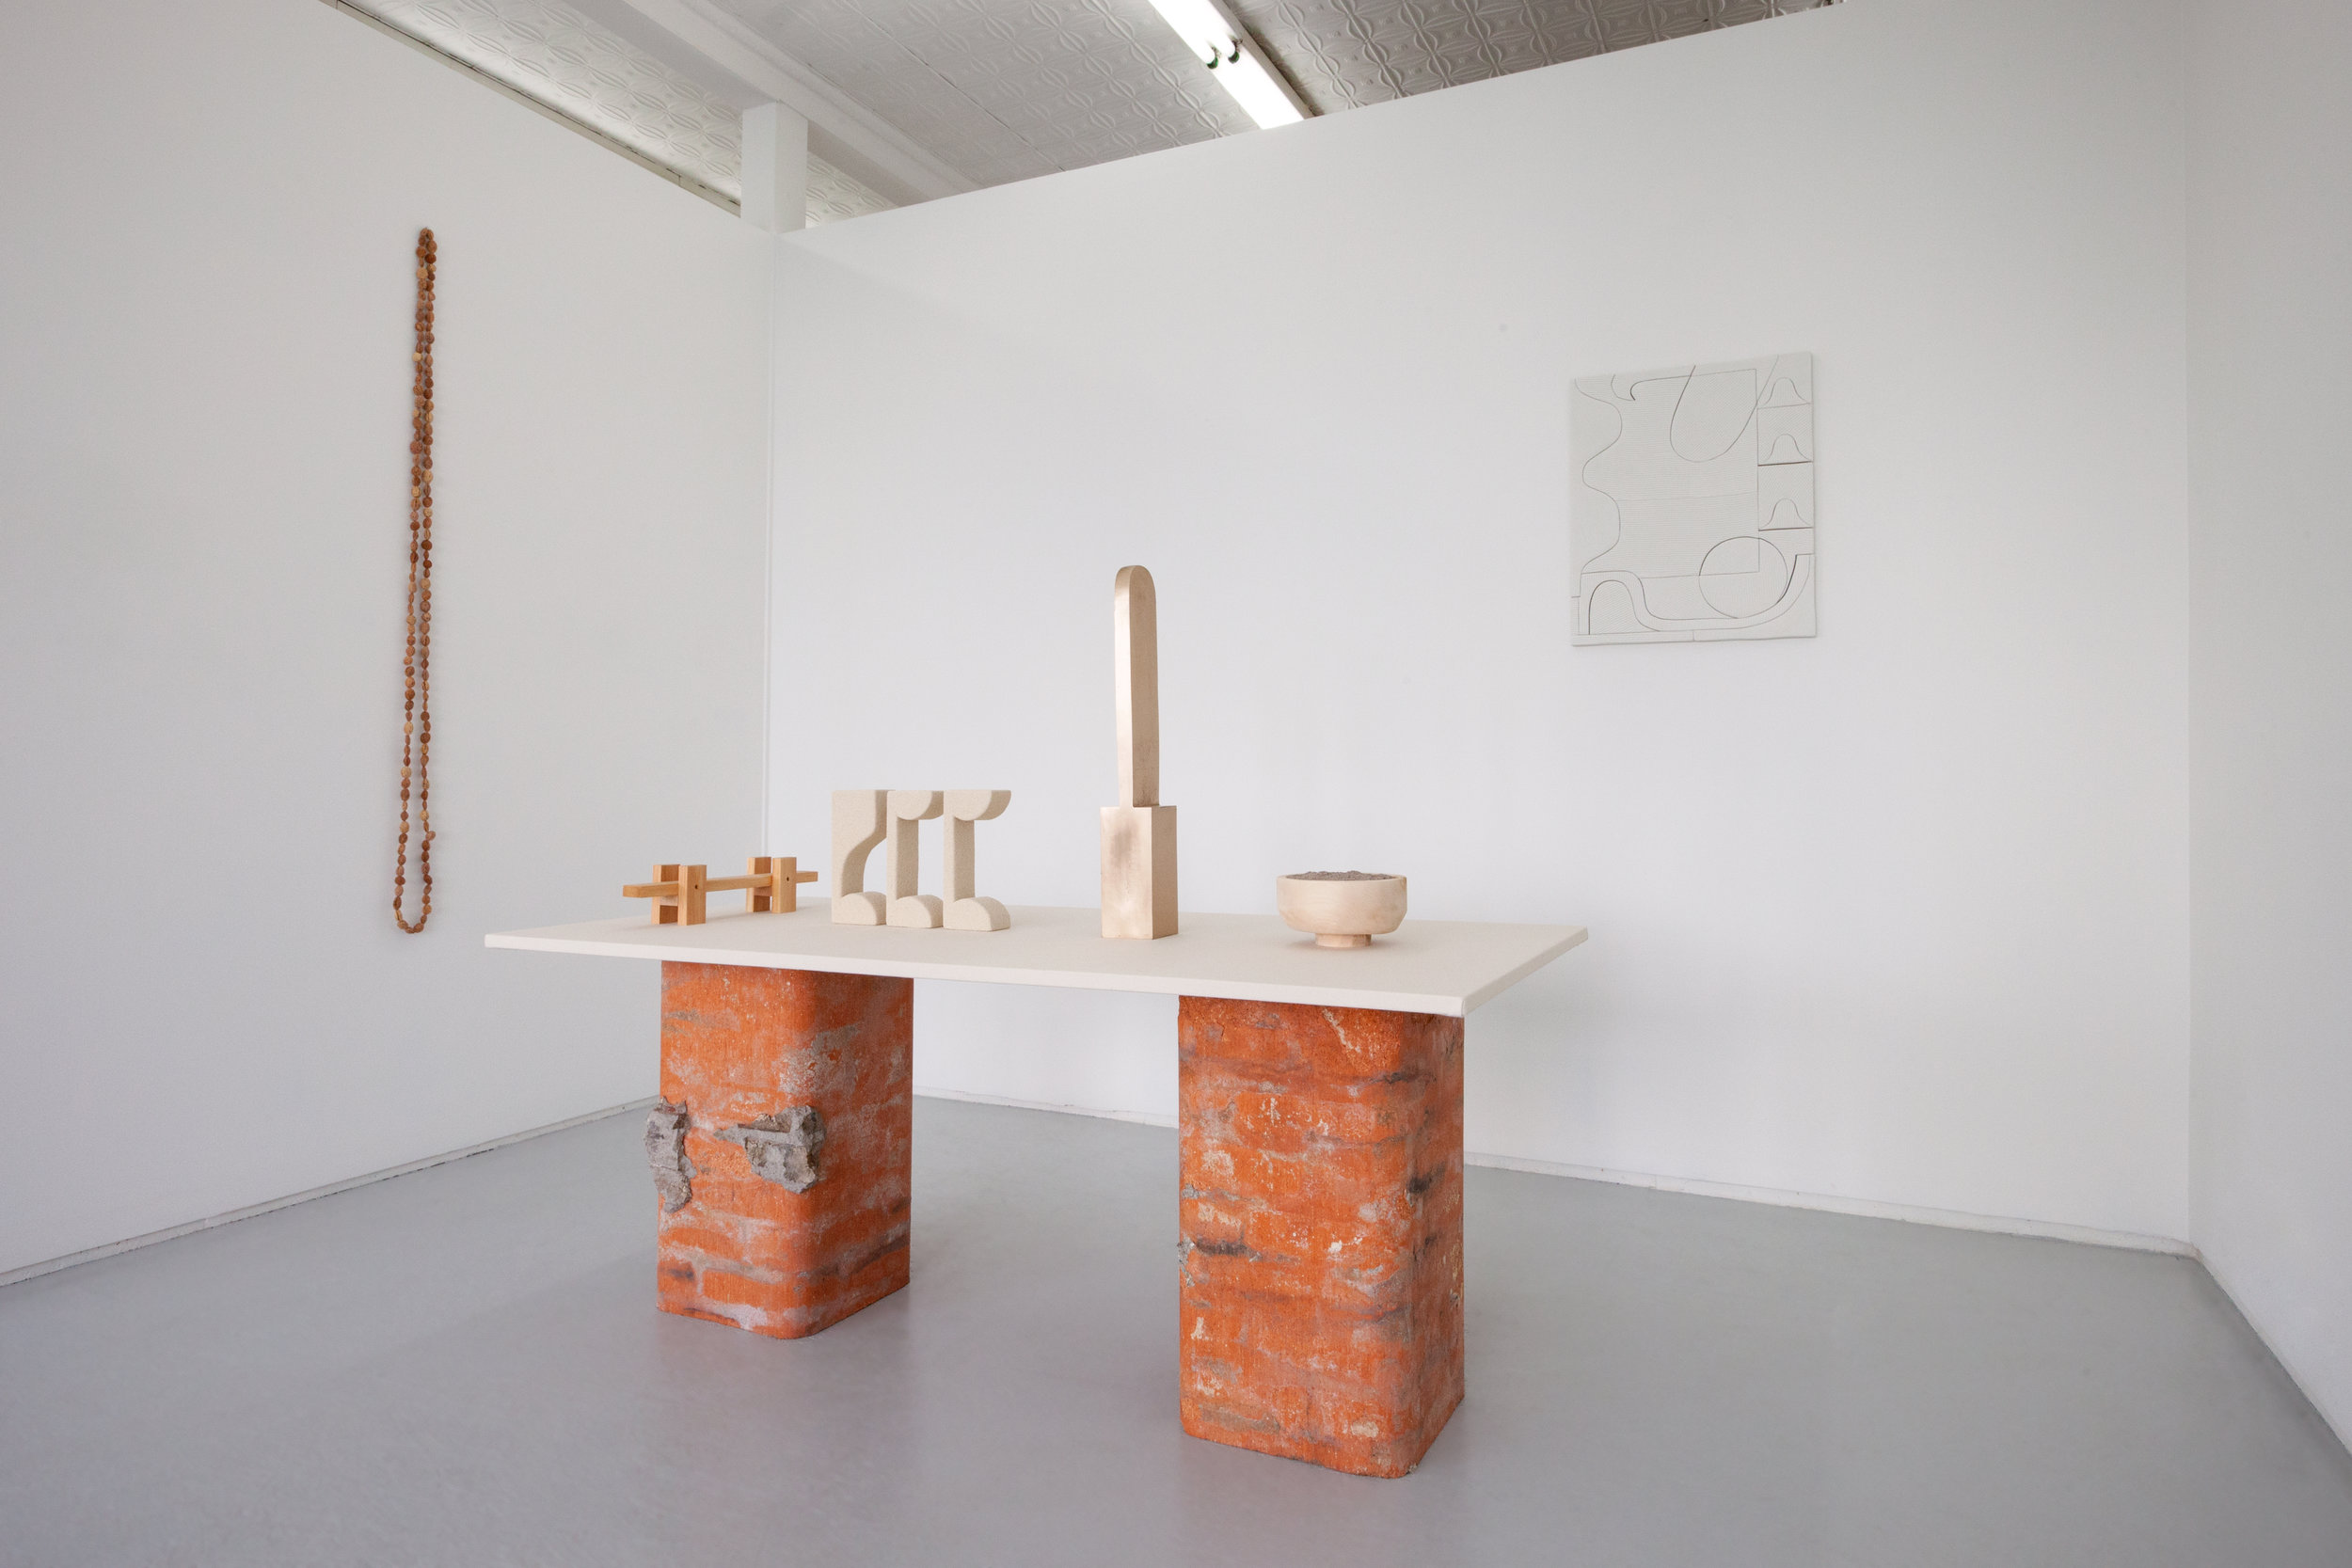 Elizabeth_Atterbury-Night_Comes_In-Installation_View_006.jpg